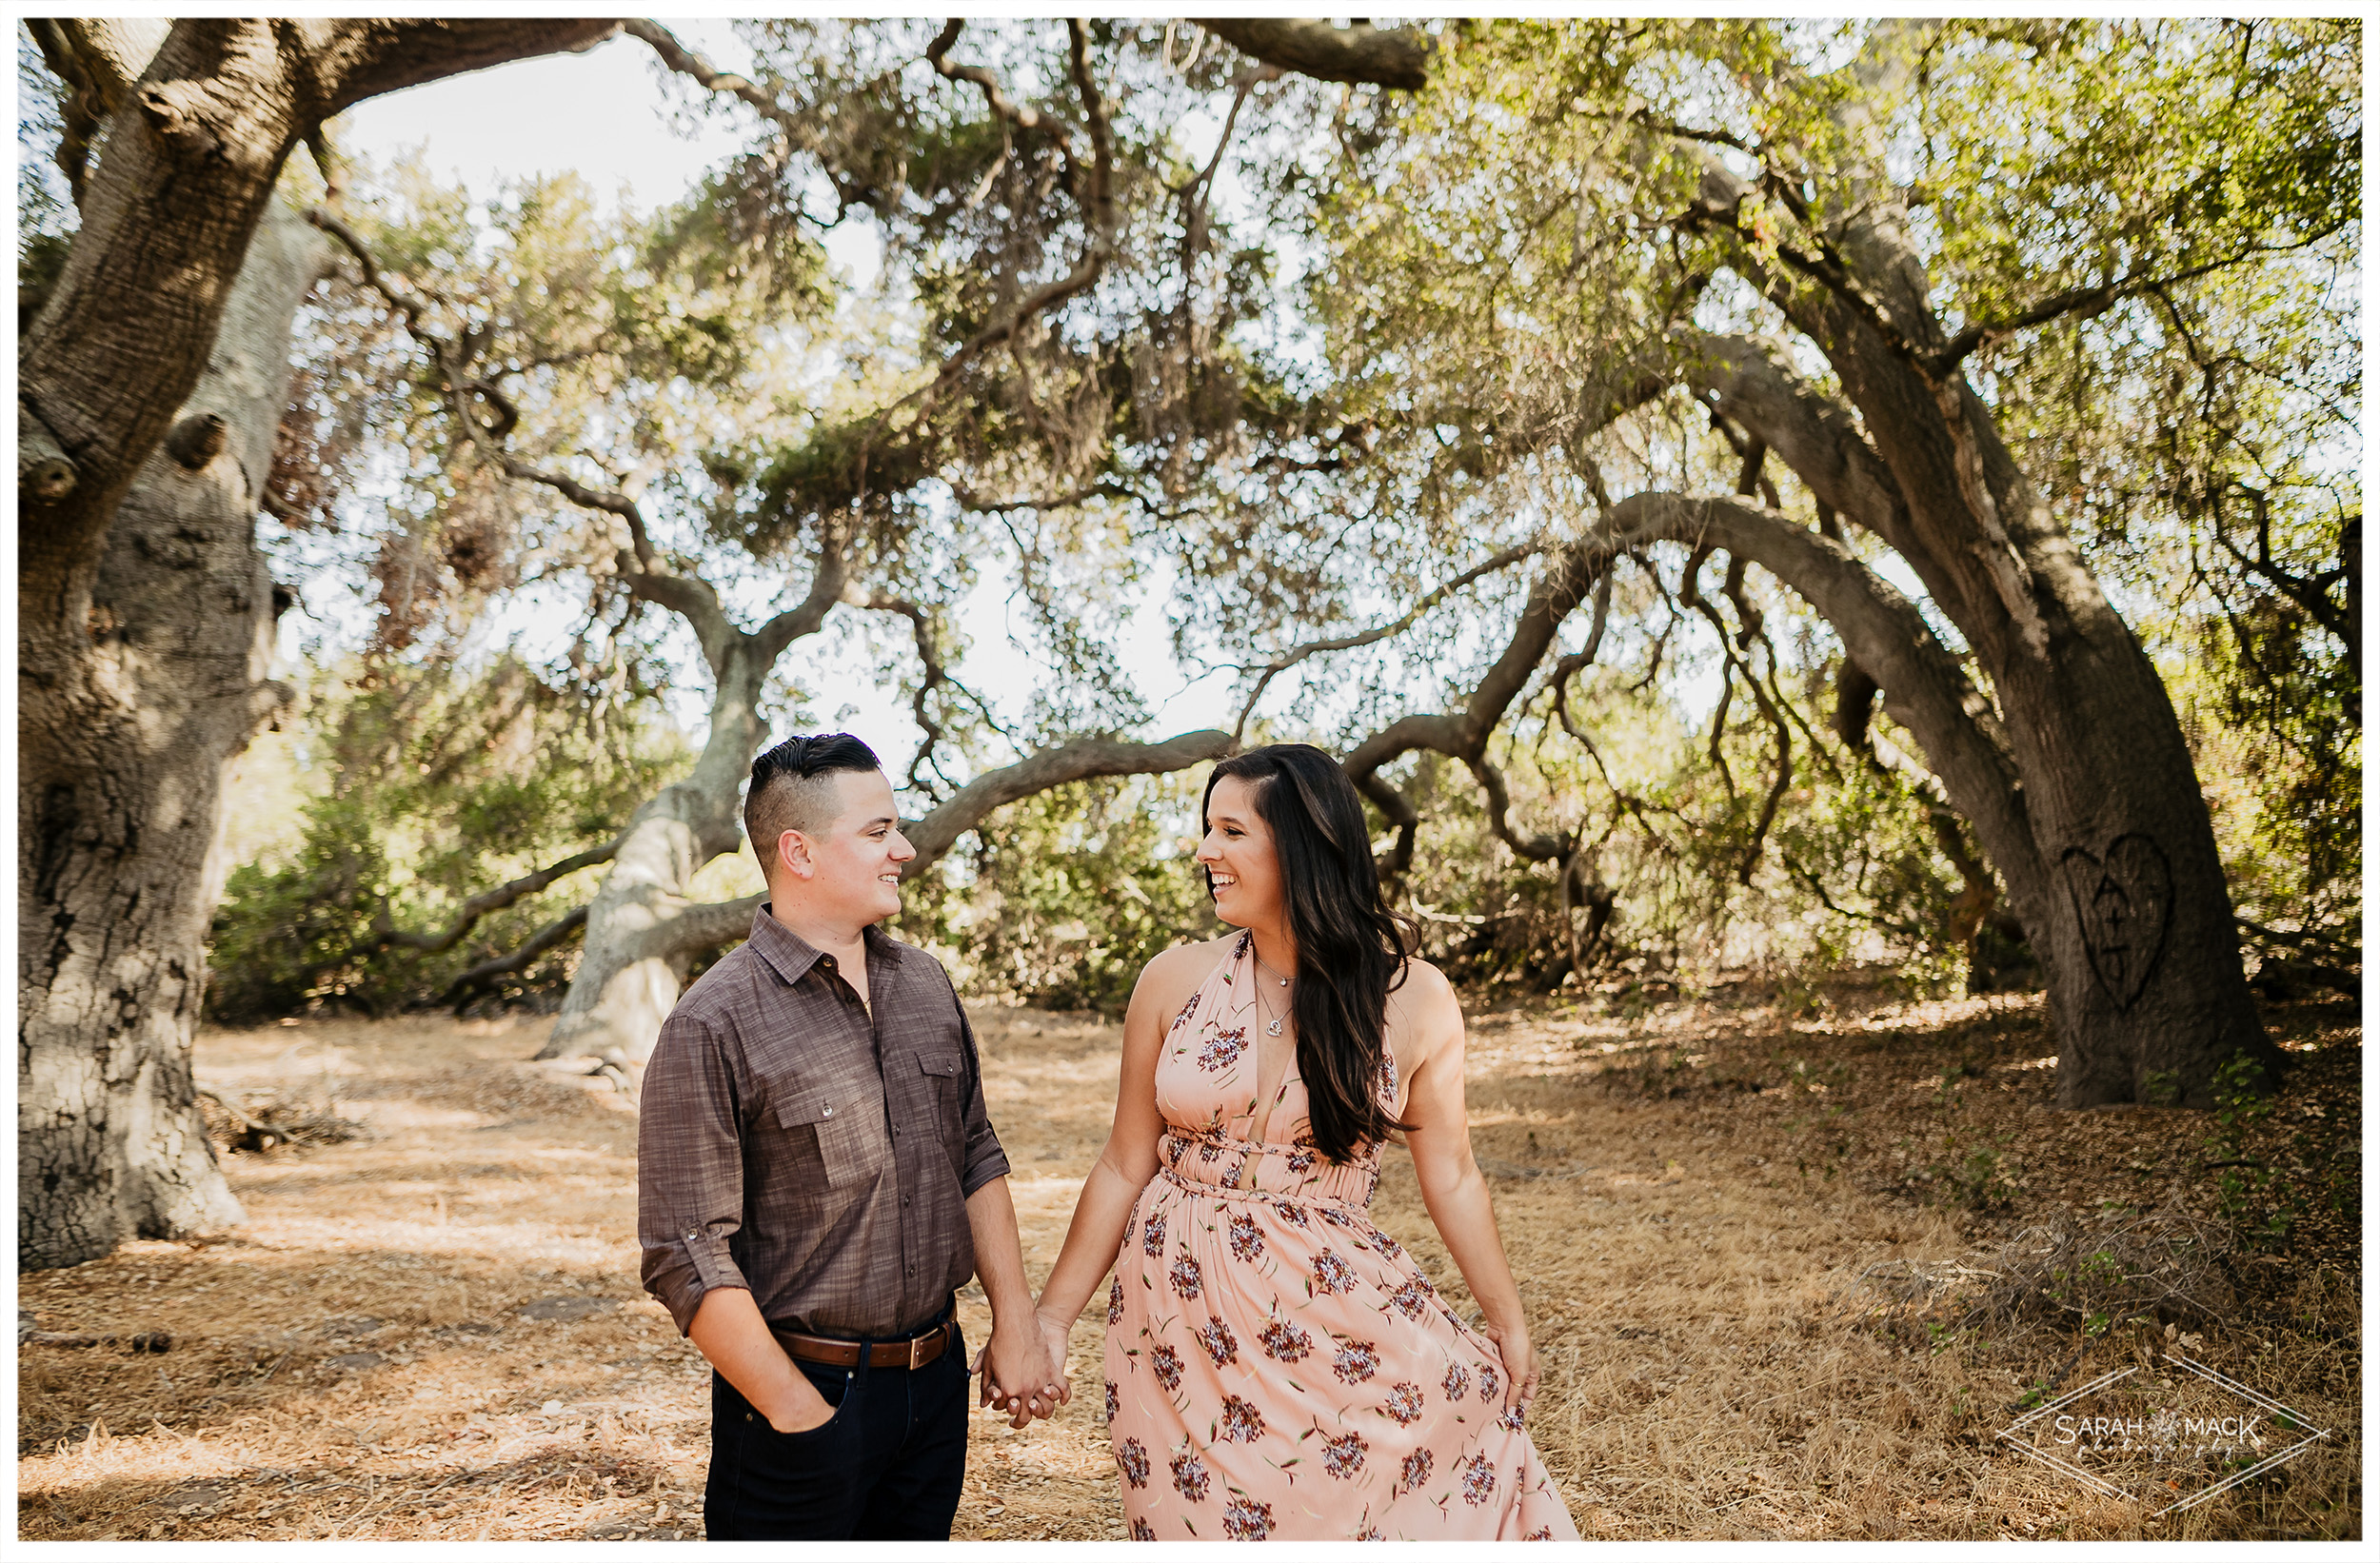 TM-Laguna-Beach-Orange-County-Engagement-Photography-2.jpg